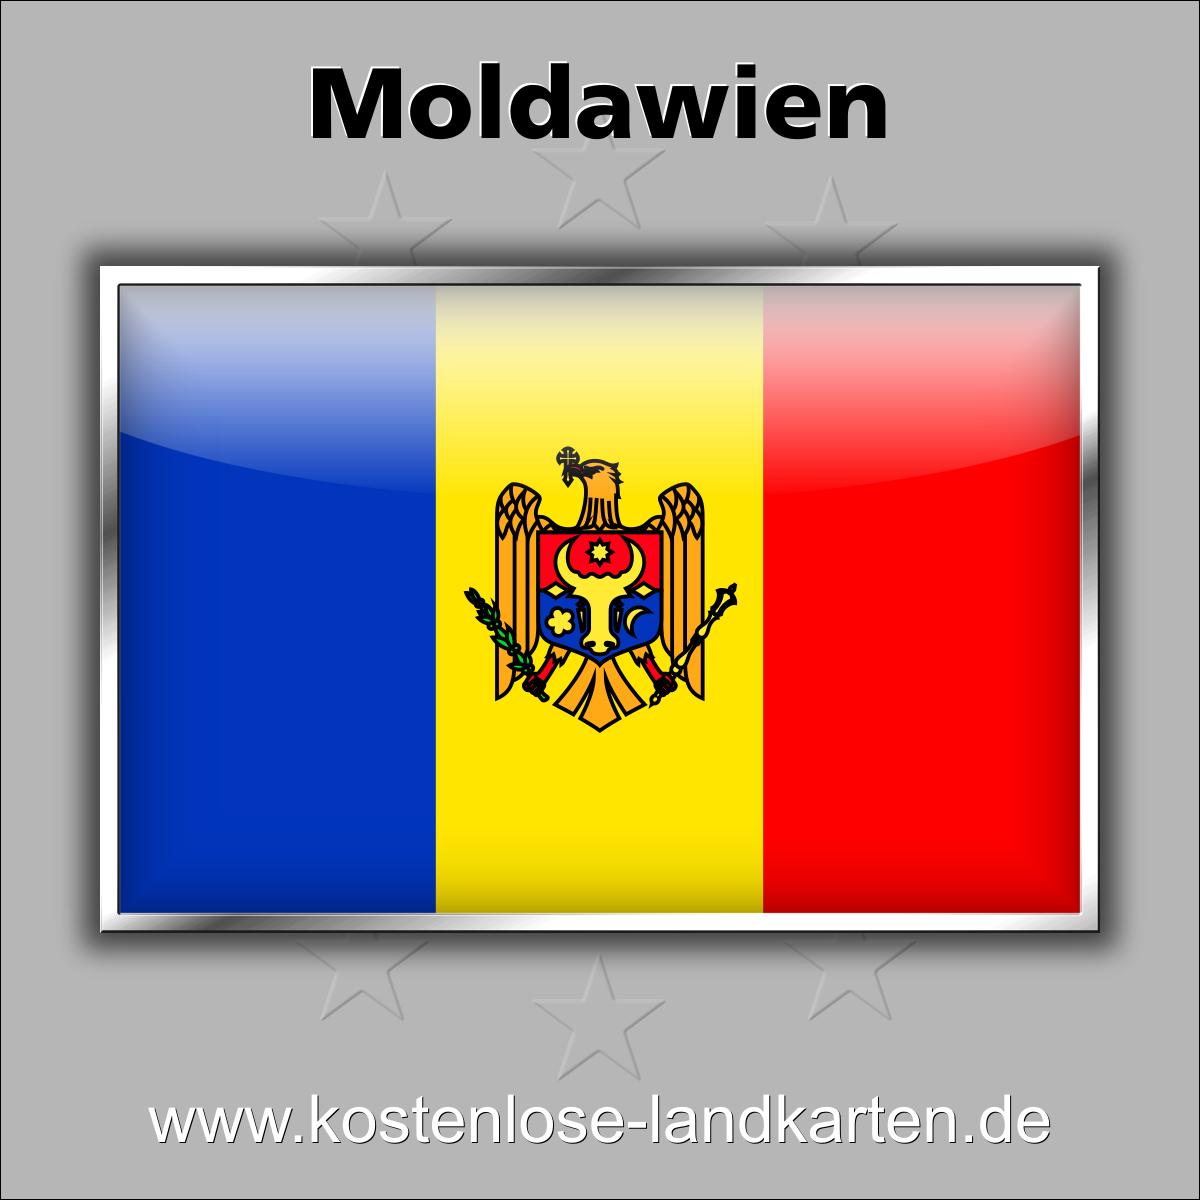 Belgien Flagge Ausmalen Die Bilder Coleection